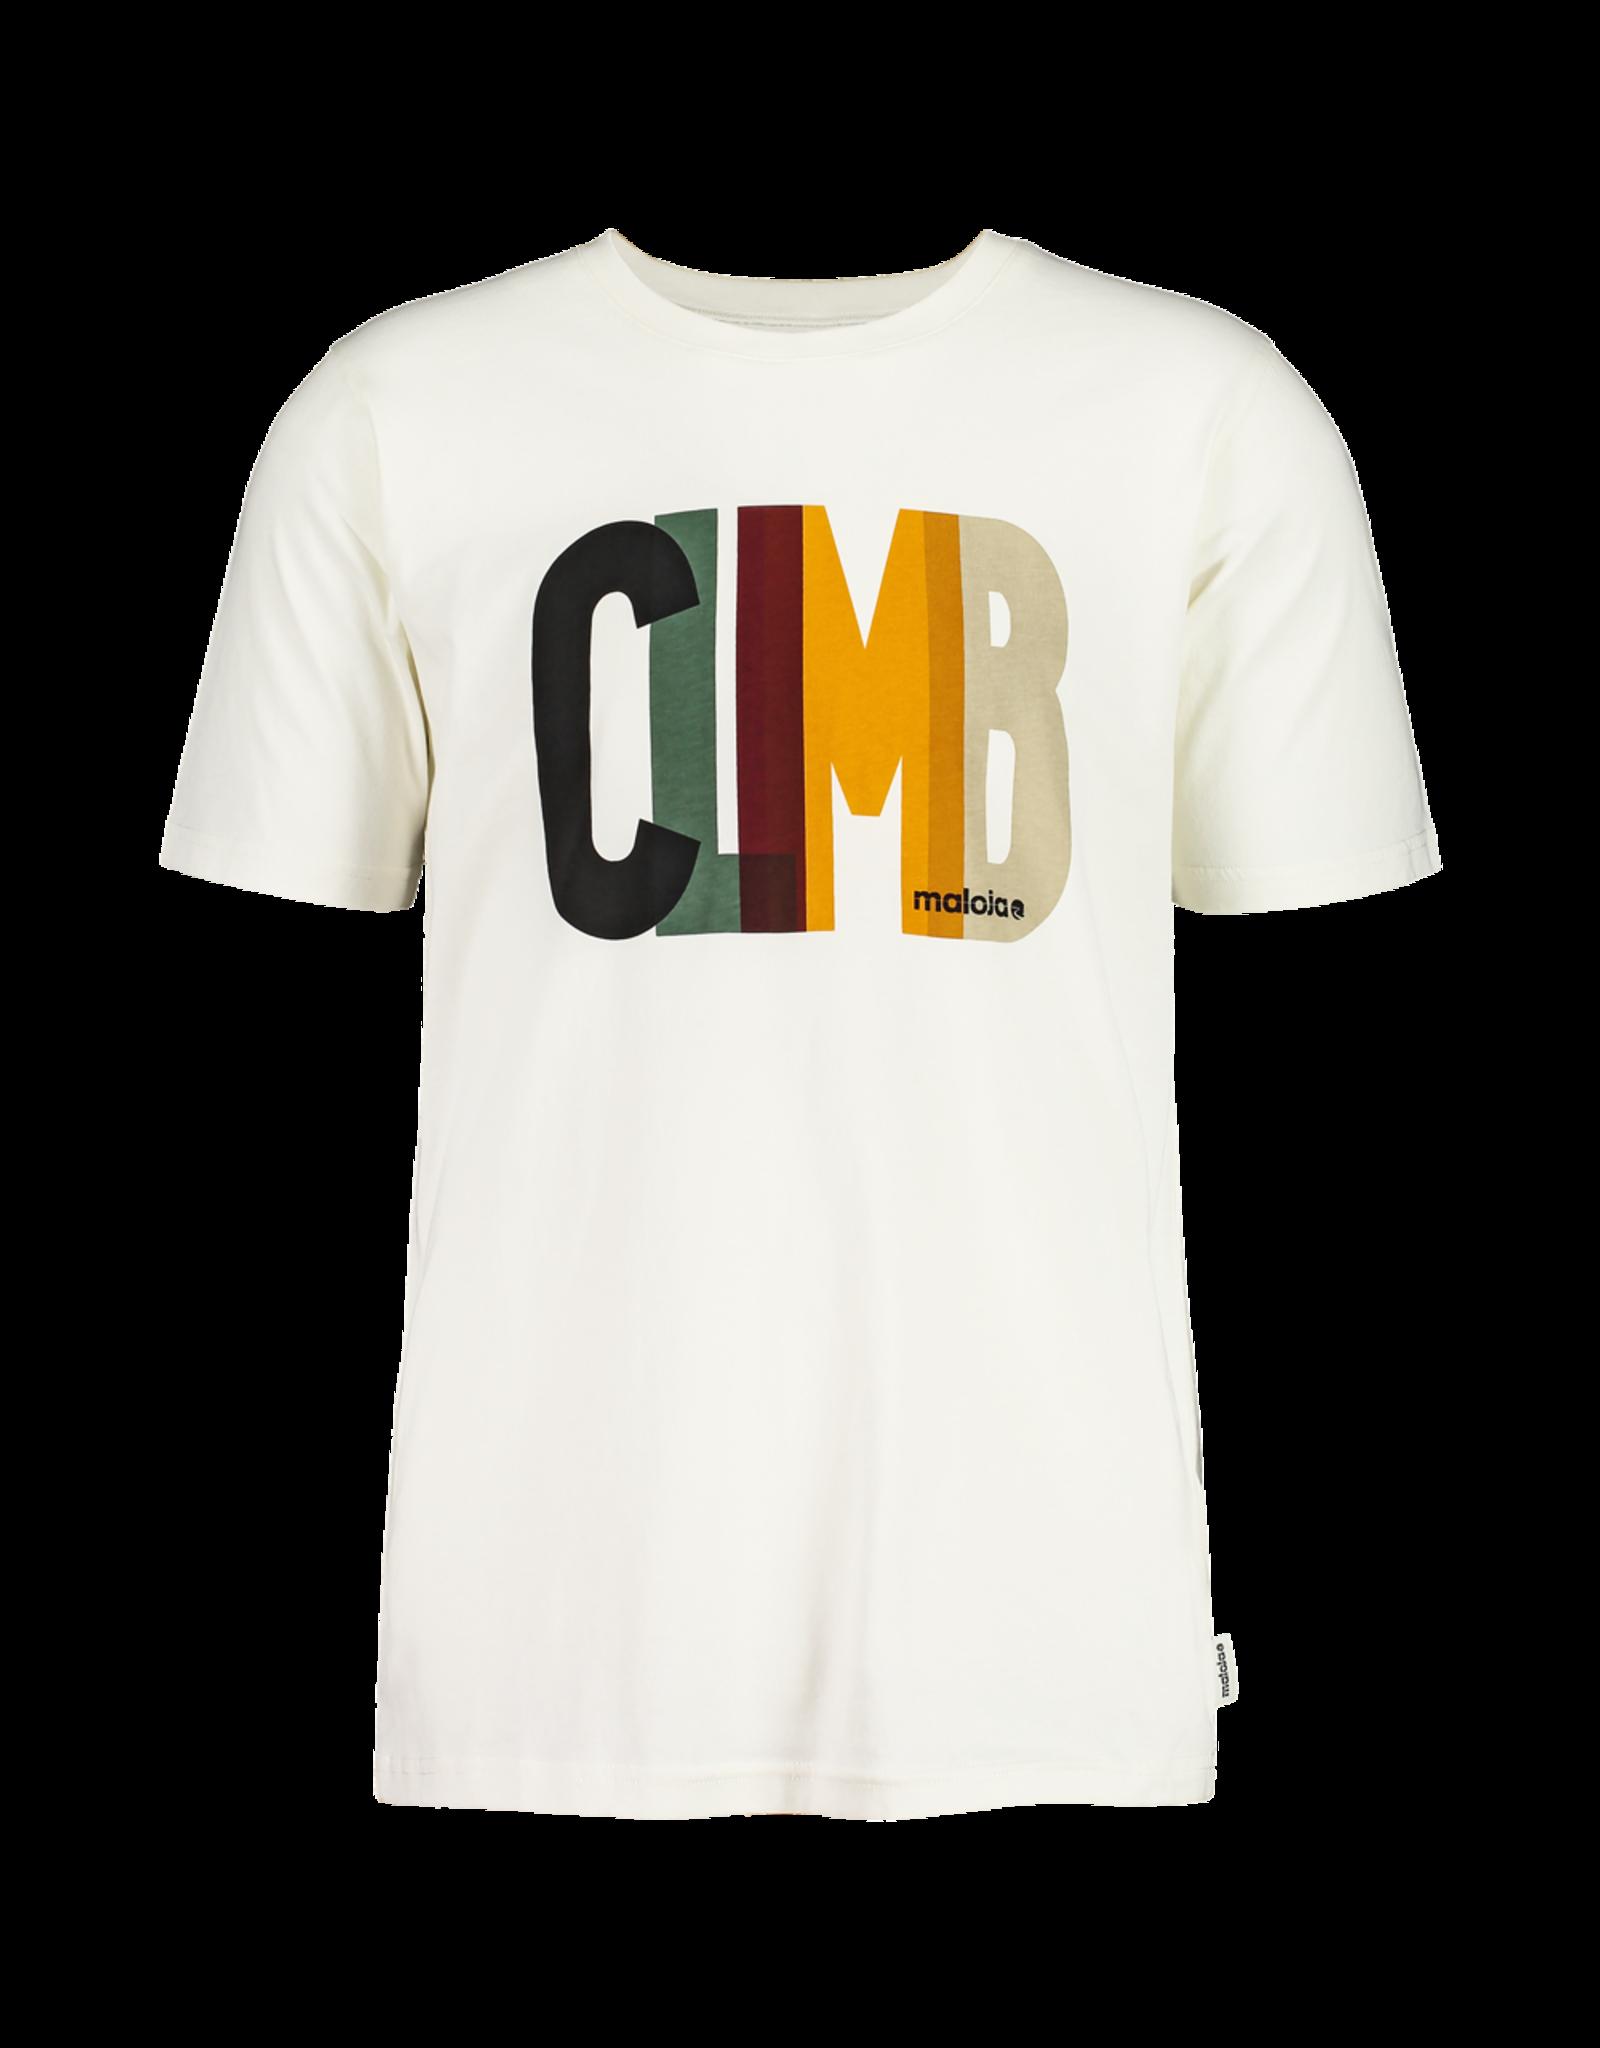 maloja 29505-1 Praluong t-shirt